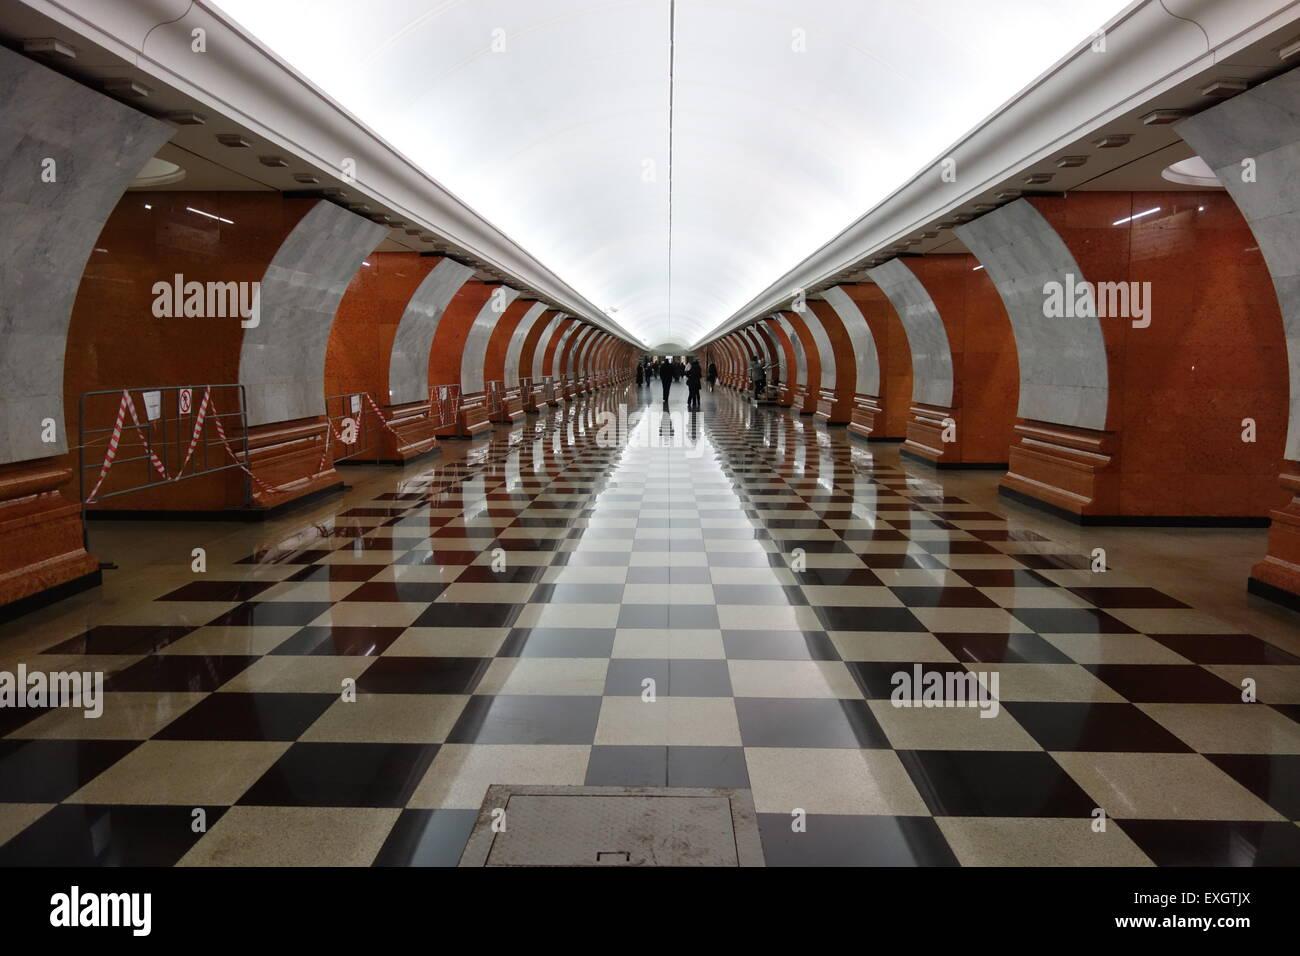 Park Pobedy station, Moscow subway (metro) - Stock Image